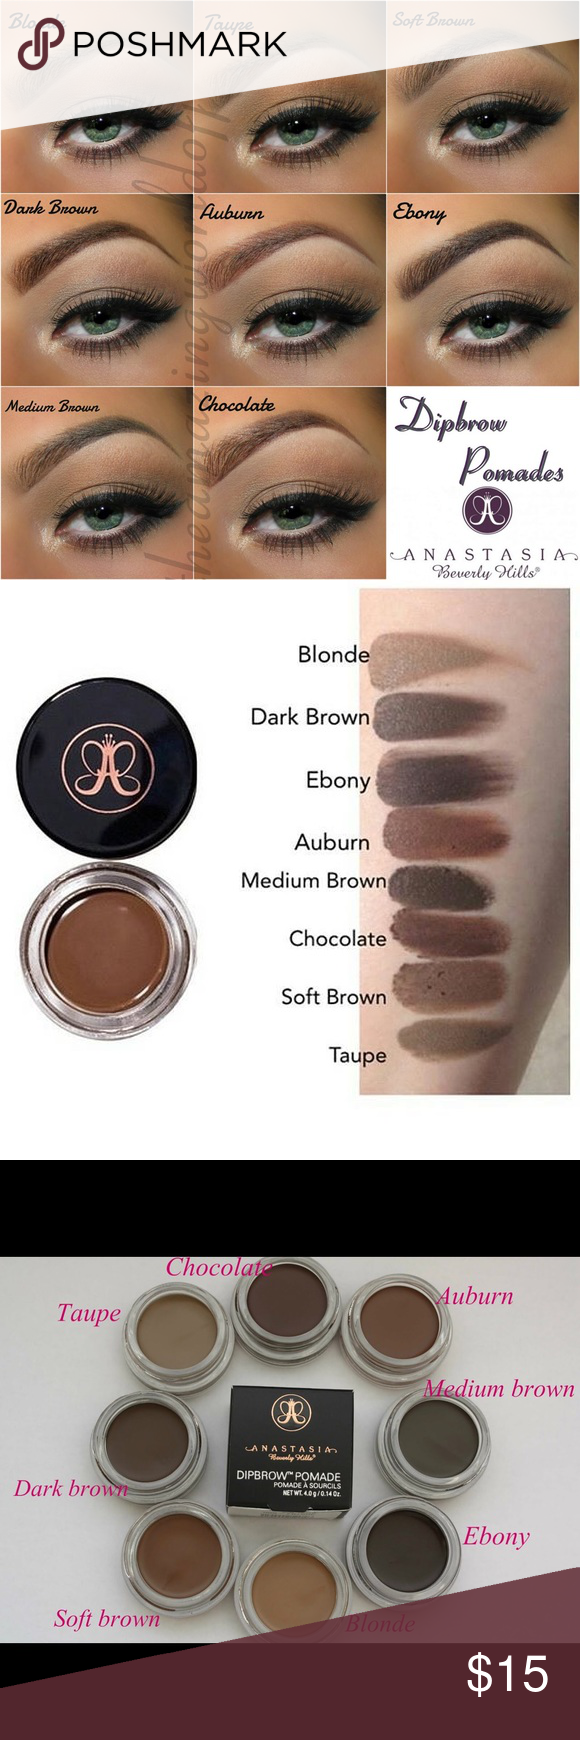 Anastasia eyebrow pomade colors-5610